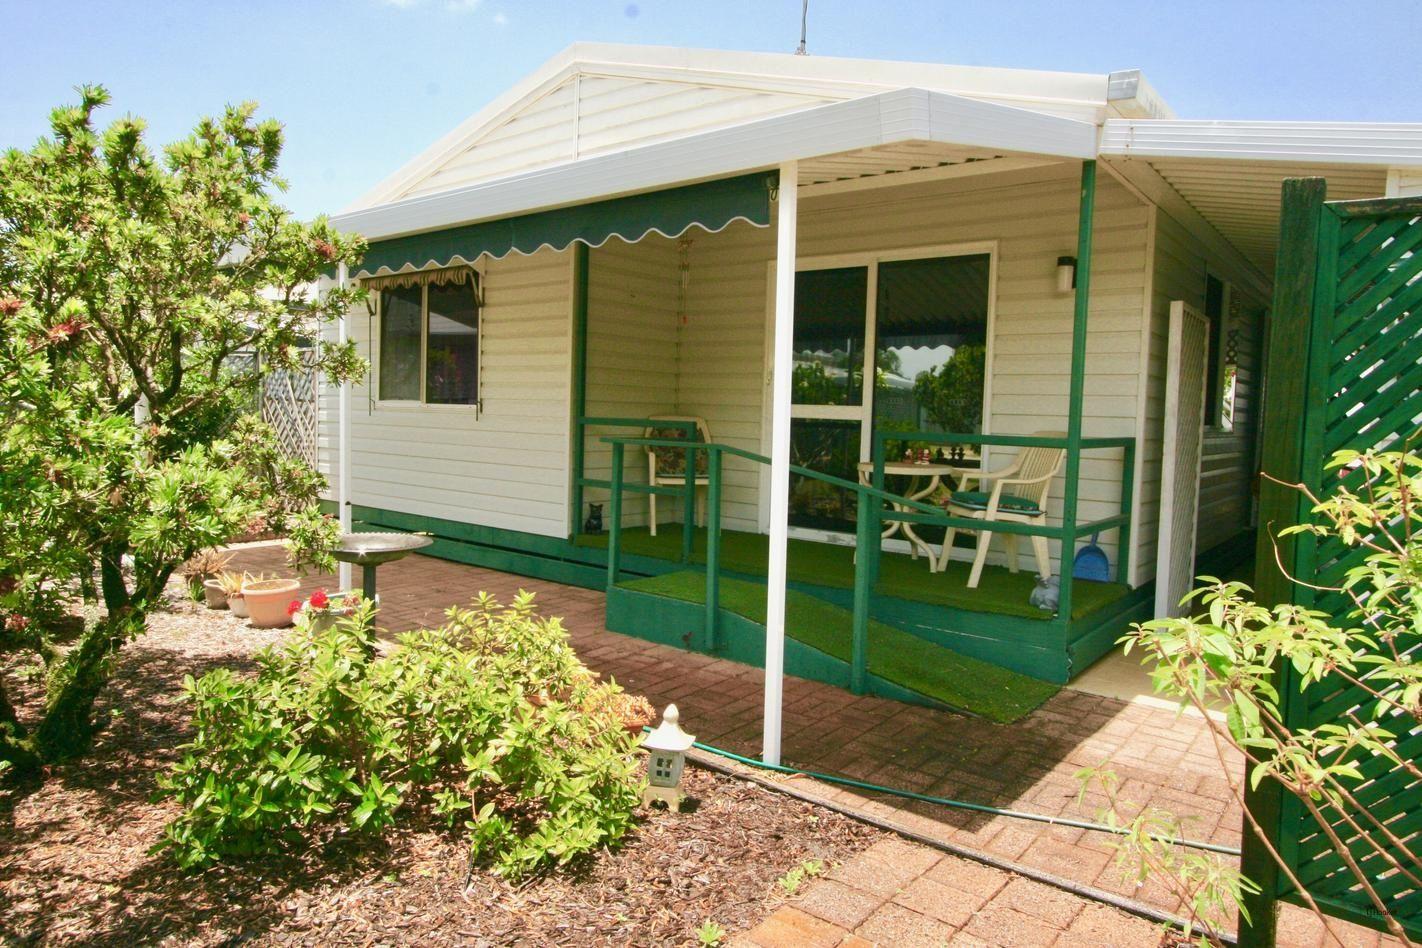 105/192 Piggabeen Road, Tweed Heads West NSW 2485, Image 0